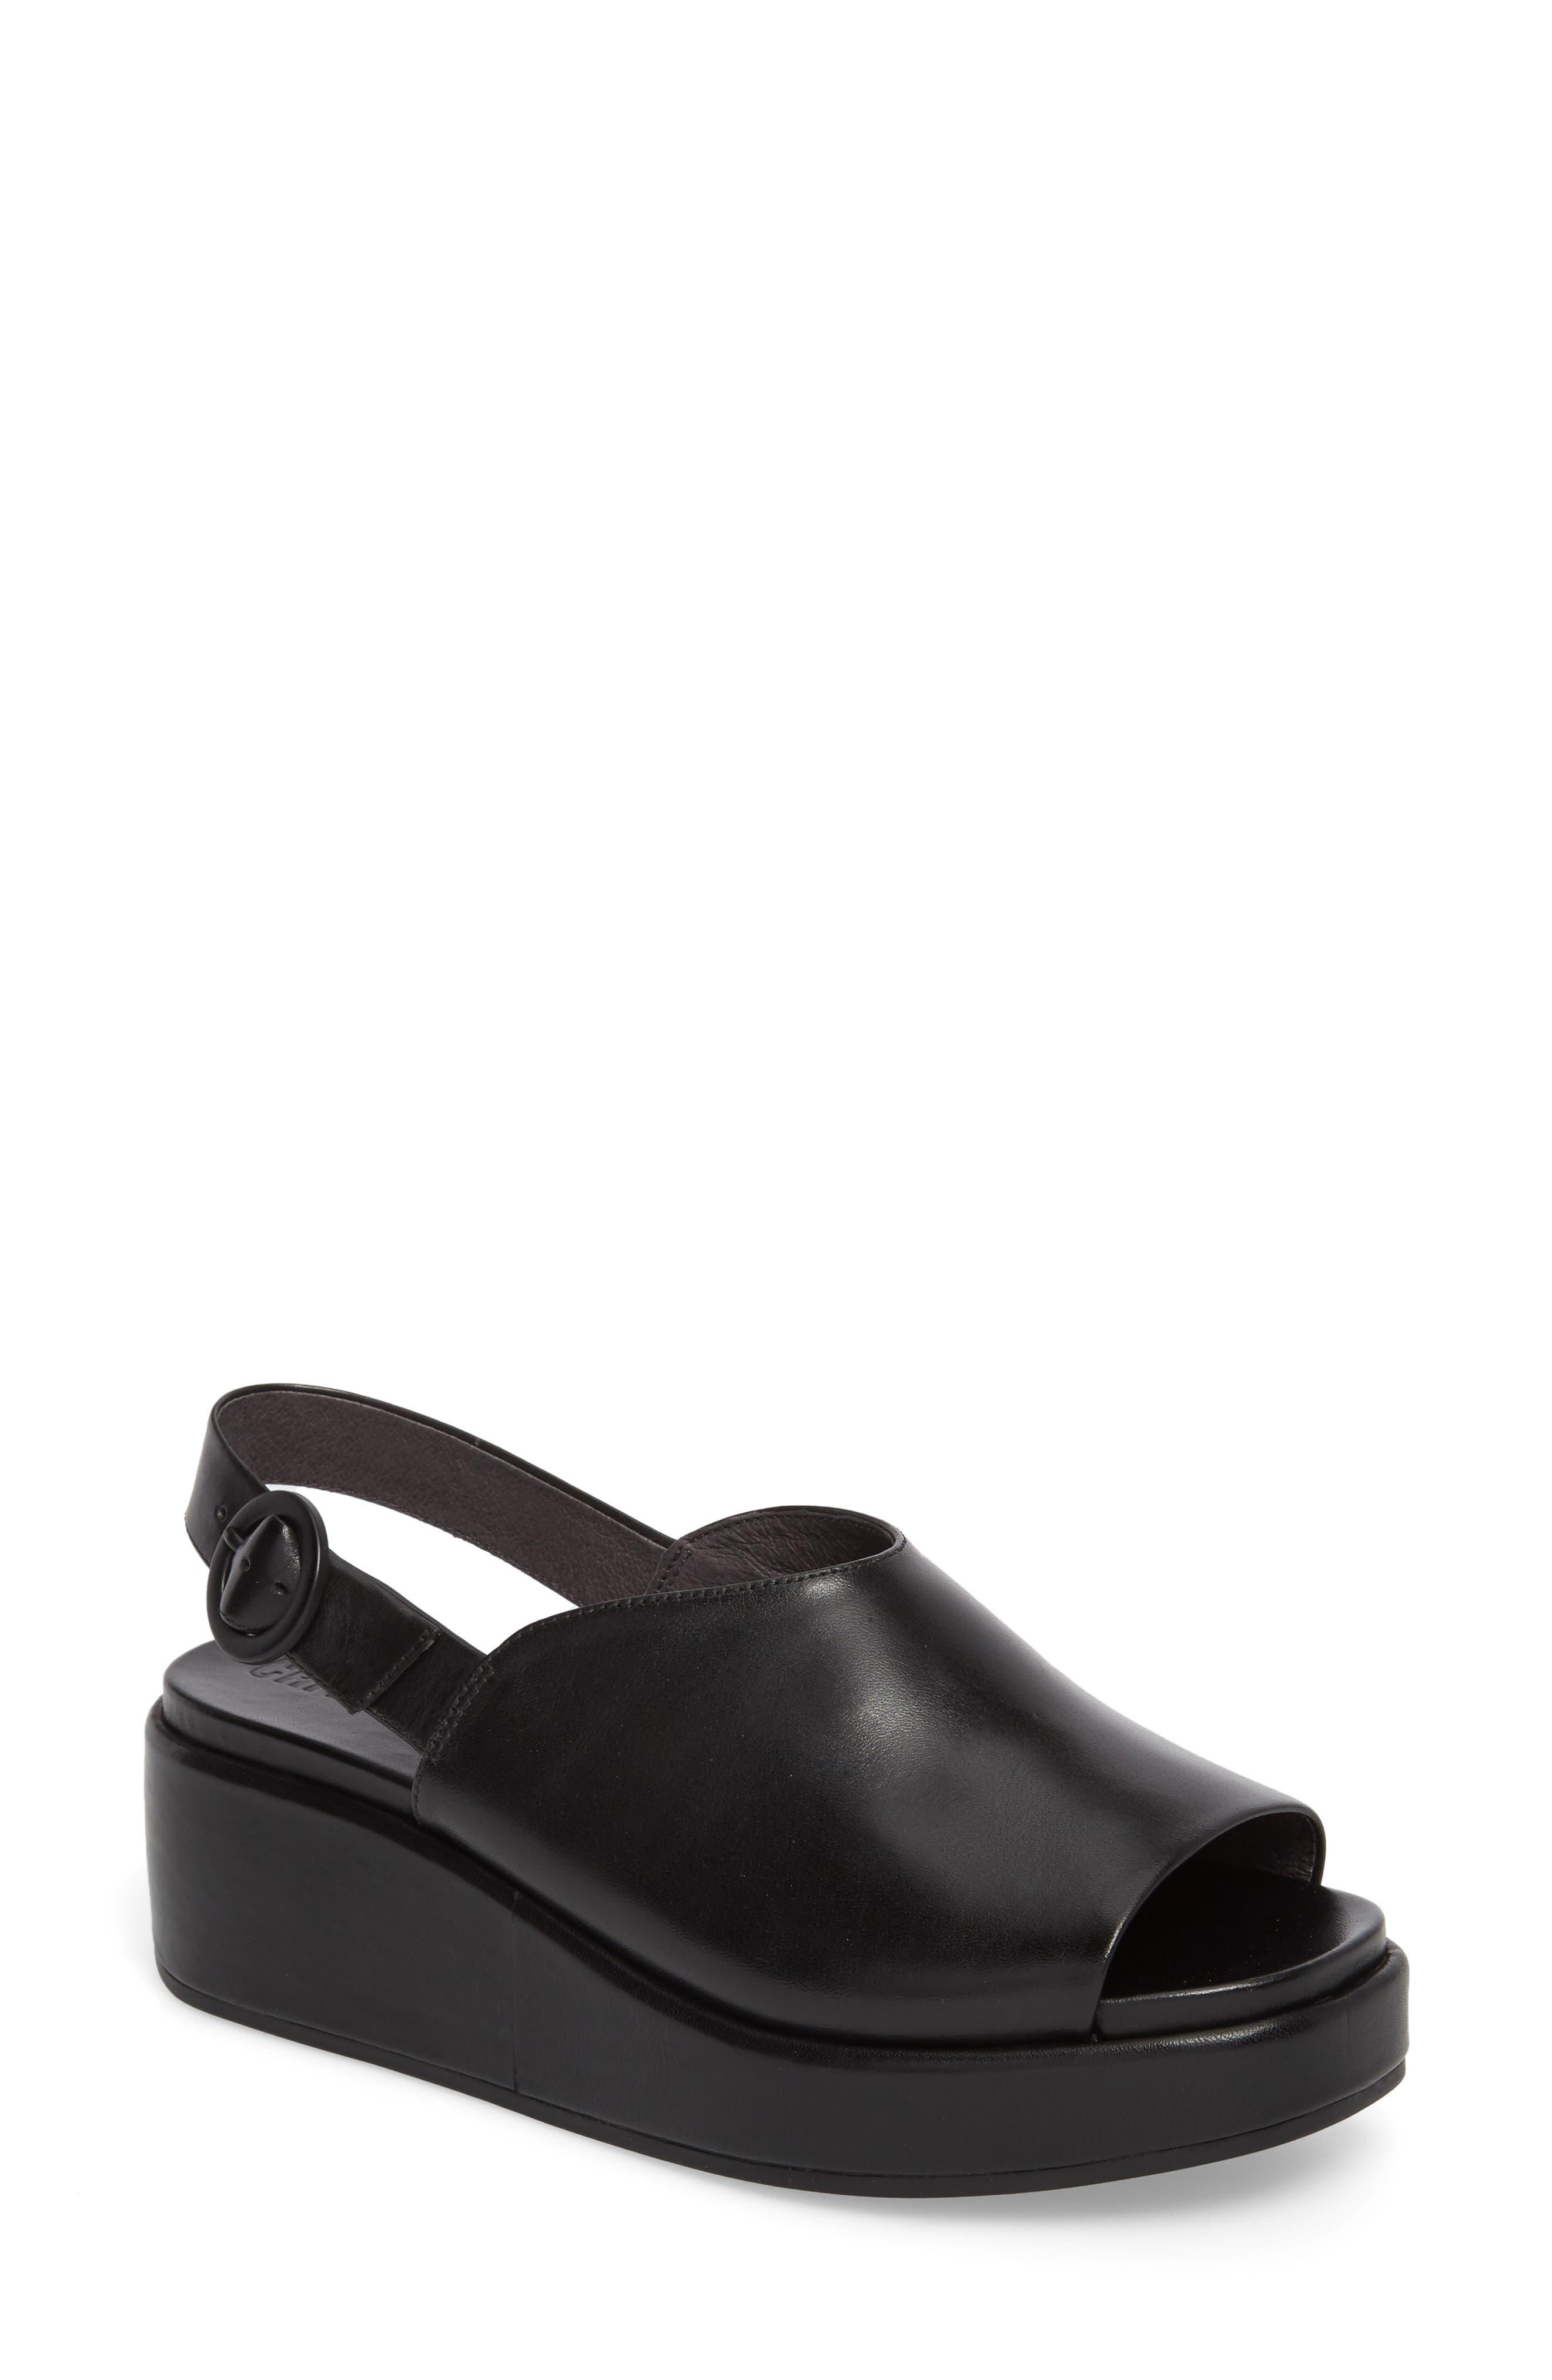 Misia Slingback Platform Wedge Sandal,                             Main thumbnail 1, color,                             Black Leather